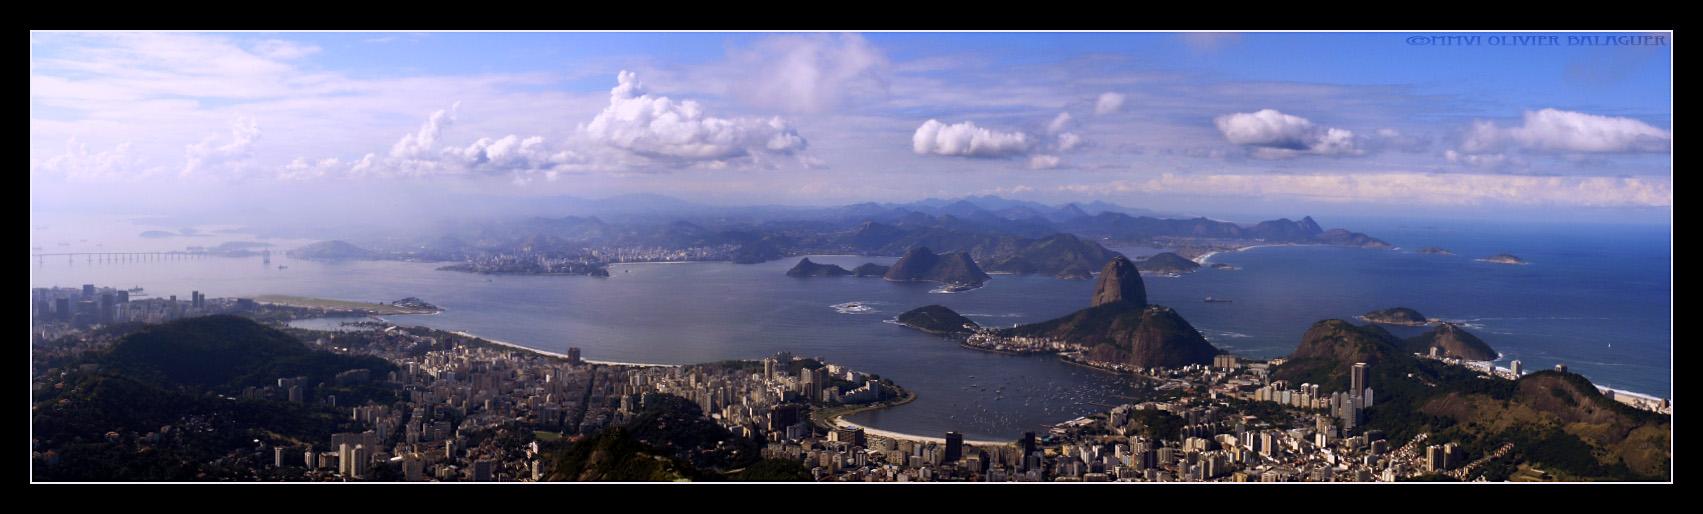 Rio de Janeiro by Hibatos